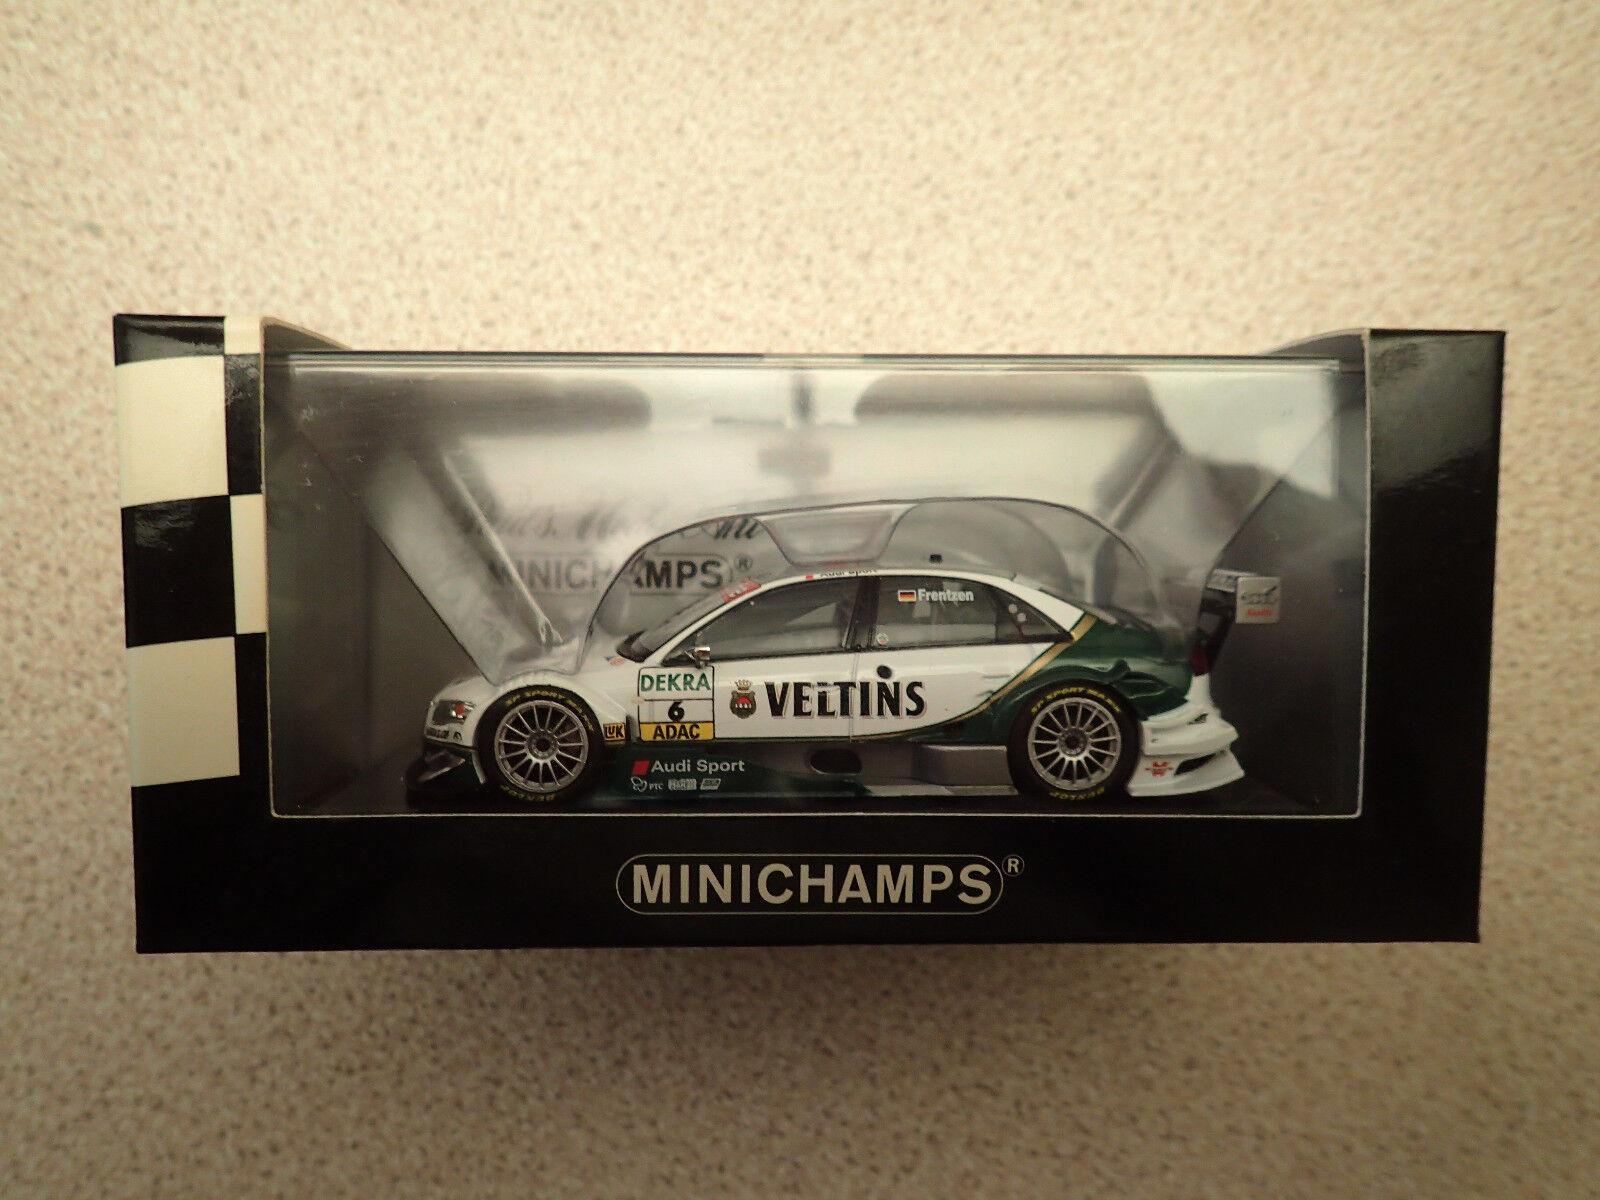 Ltd Edn Minichamps 1 43 400 069606 Audi A4 DTM 2006 Team Abt Sportsline MIB